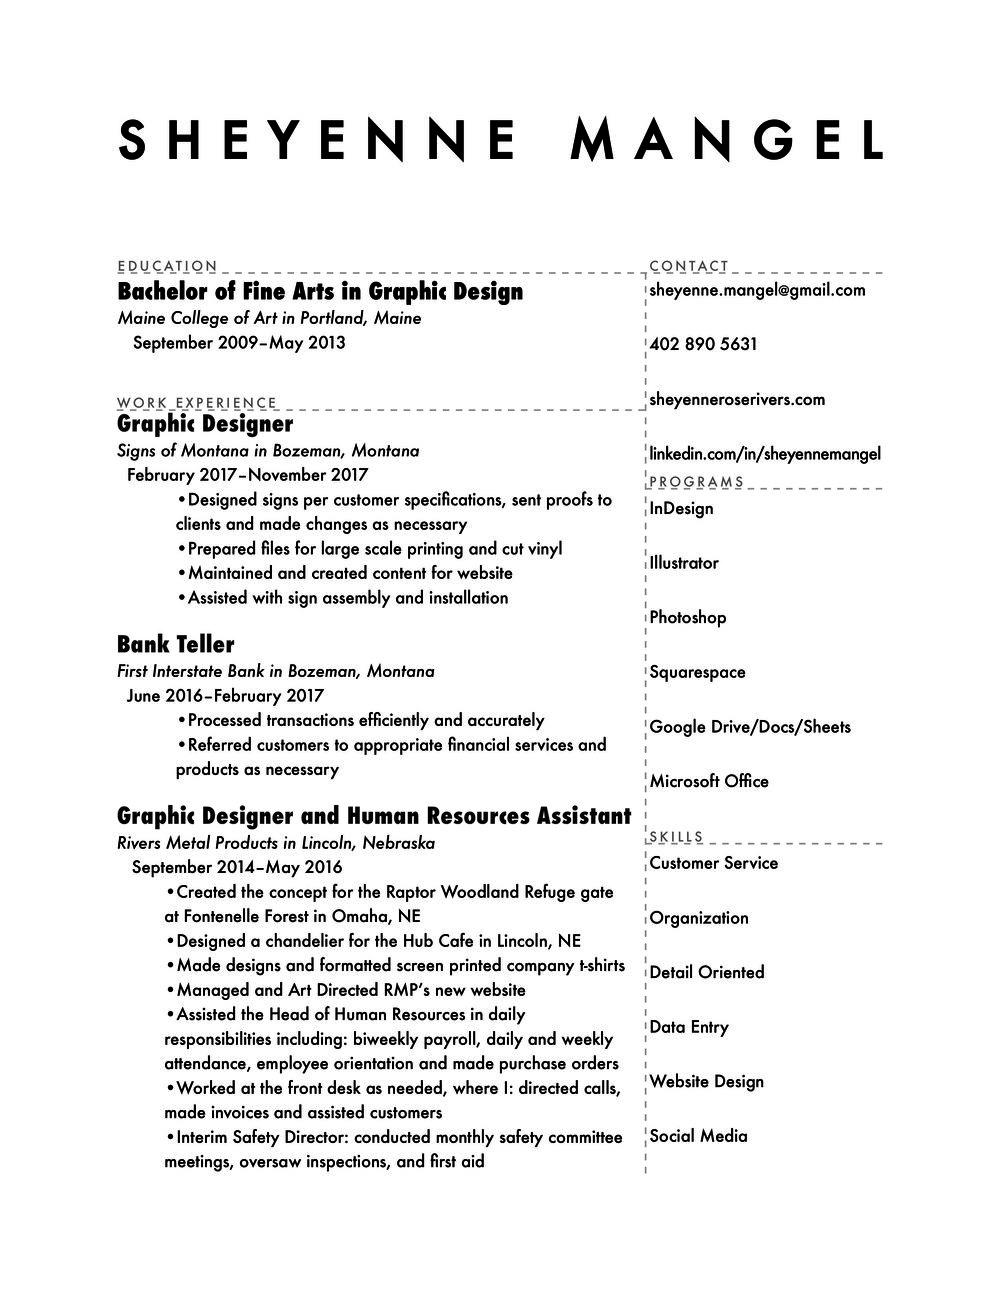 Sheyenne Mangel-Resume-web.jpg